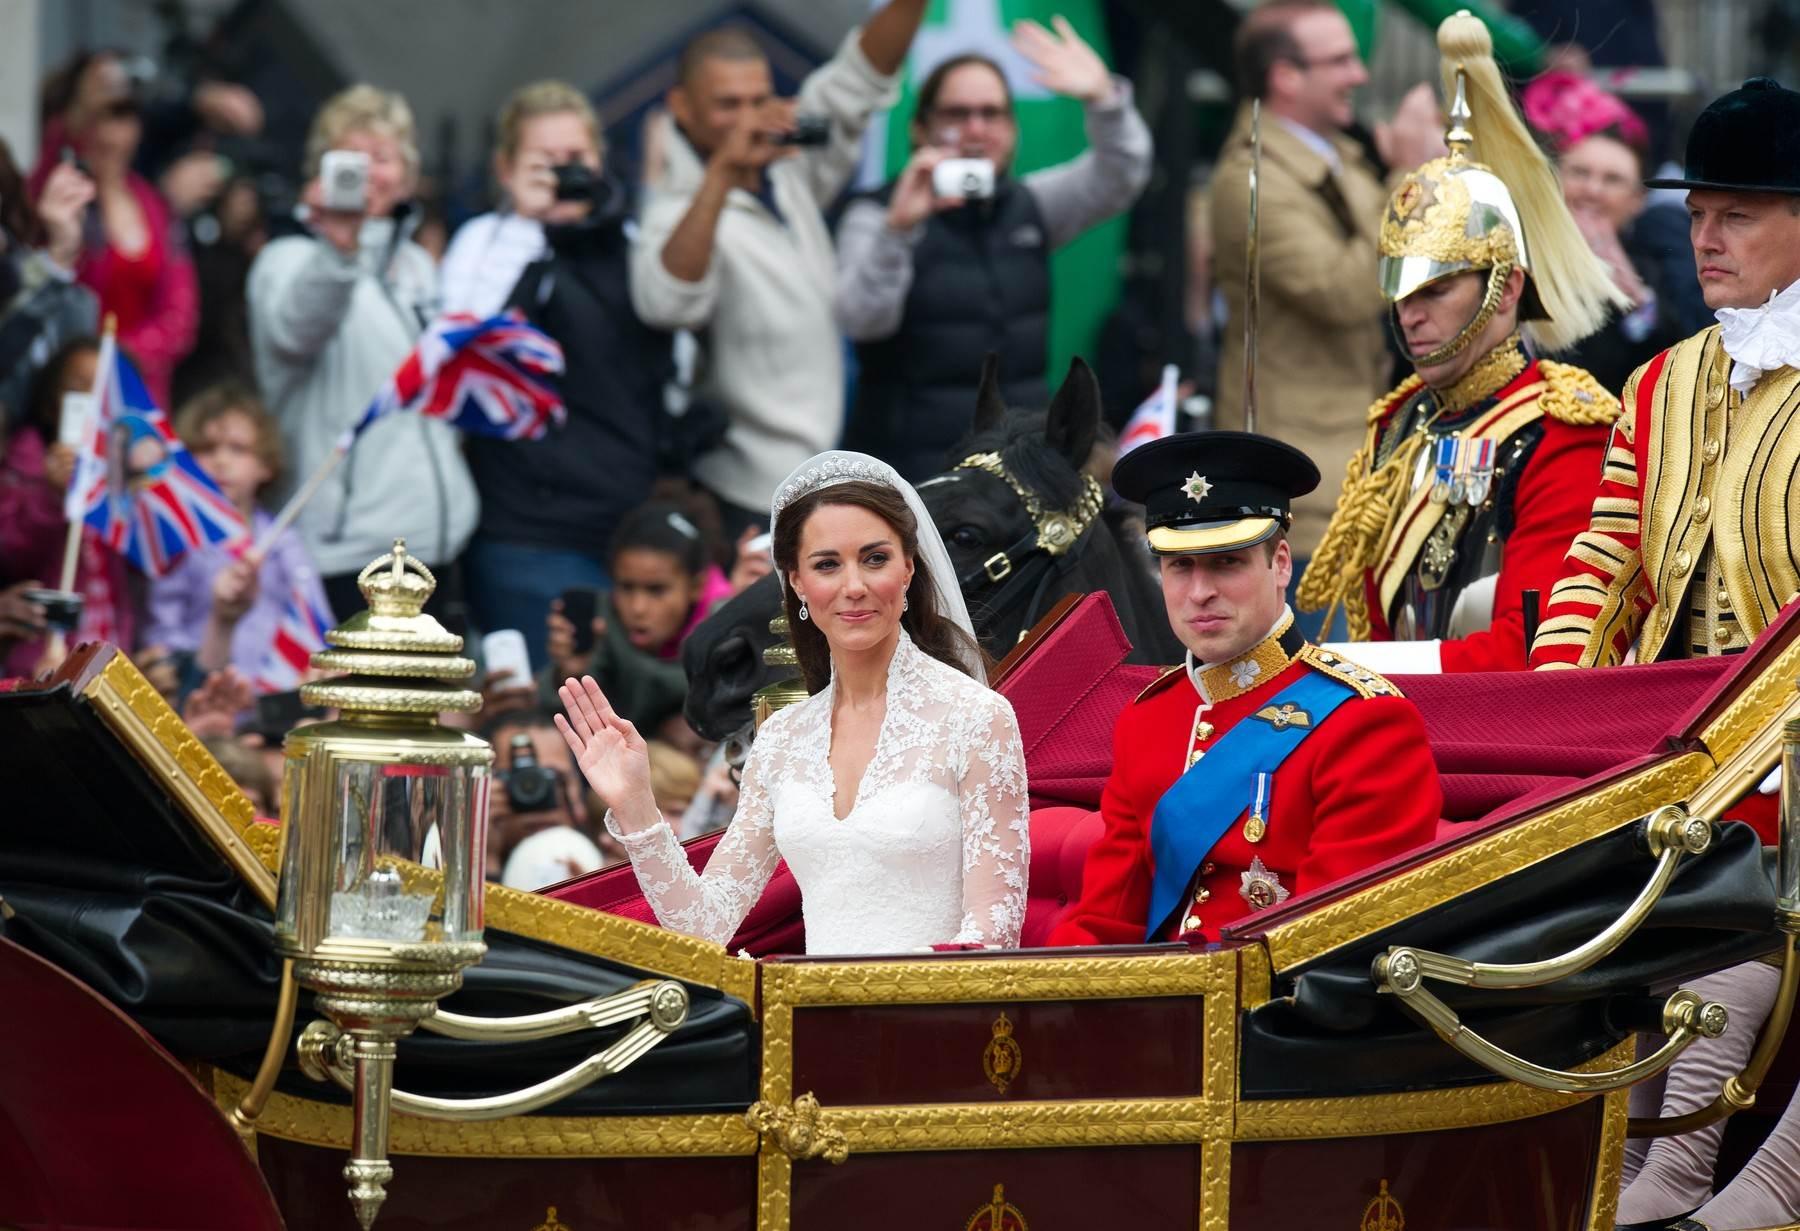 vjenčanje kate middleton princ william